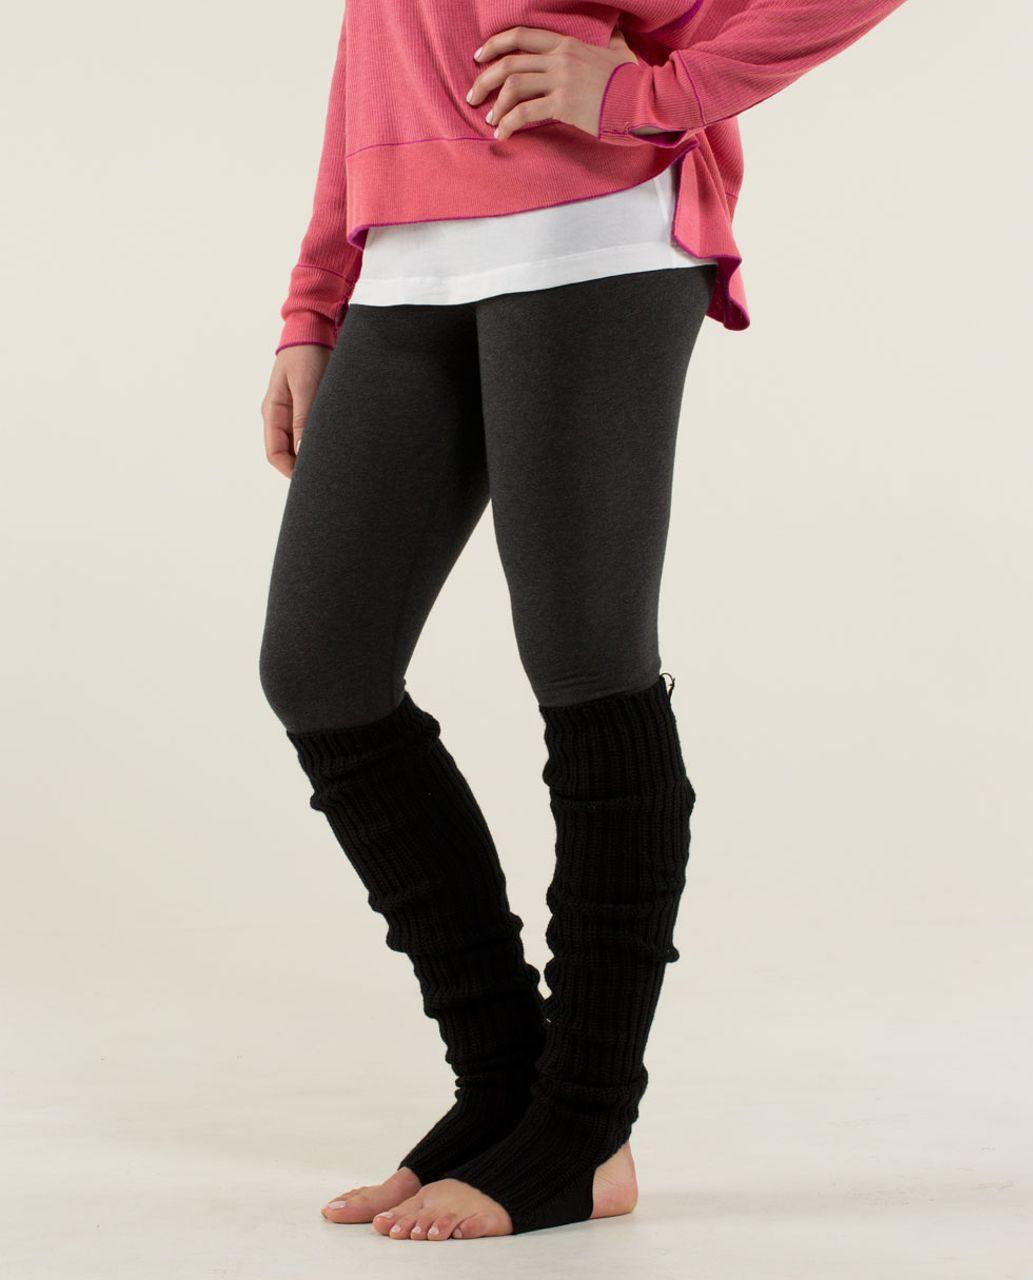 Lululemon Knit Happens Leg Warmers - Black